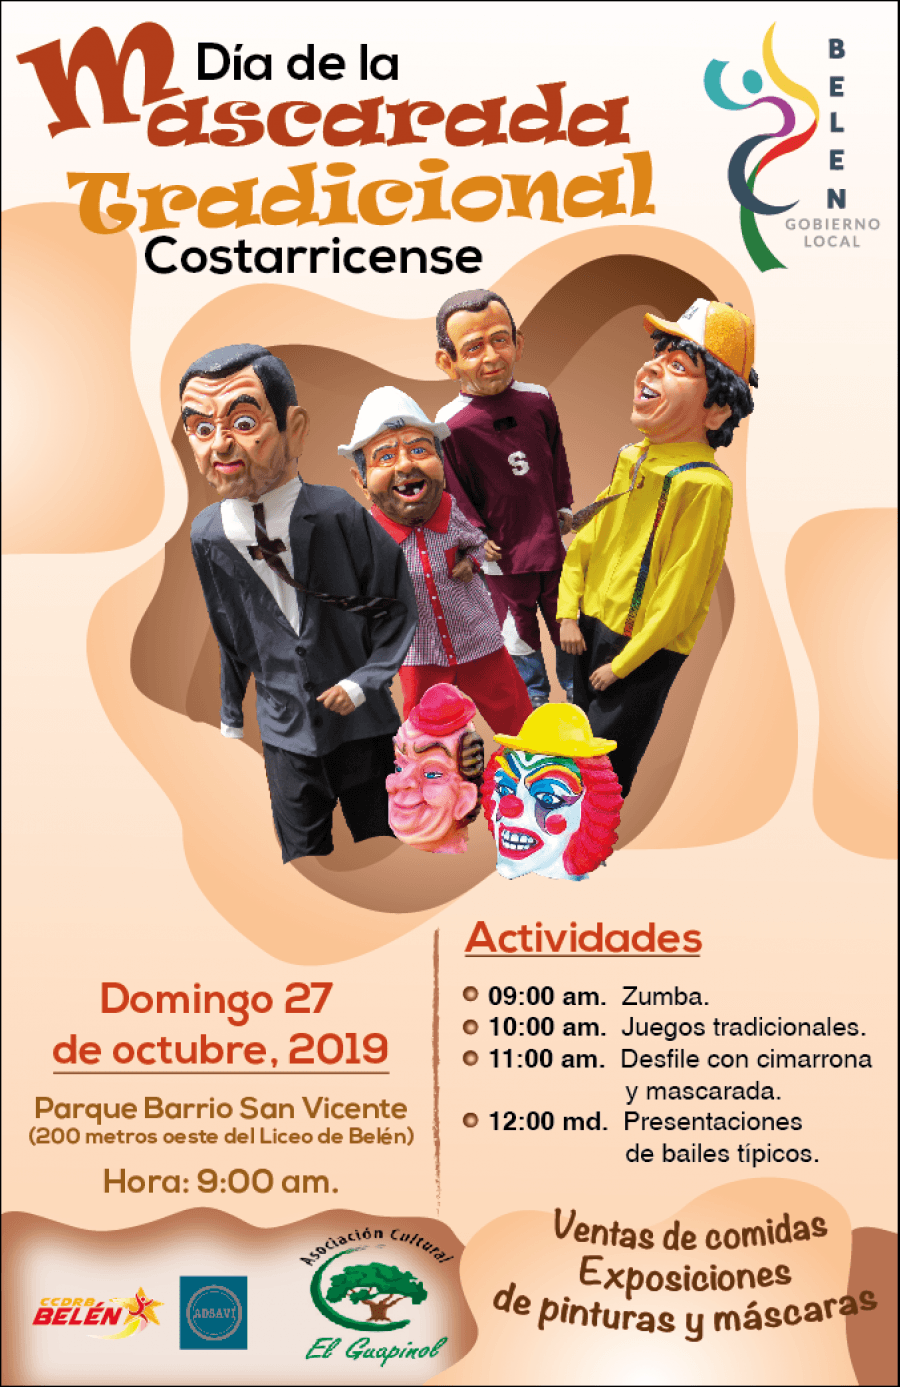 Día de la mascarada. Tradición costarricense